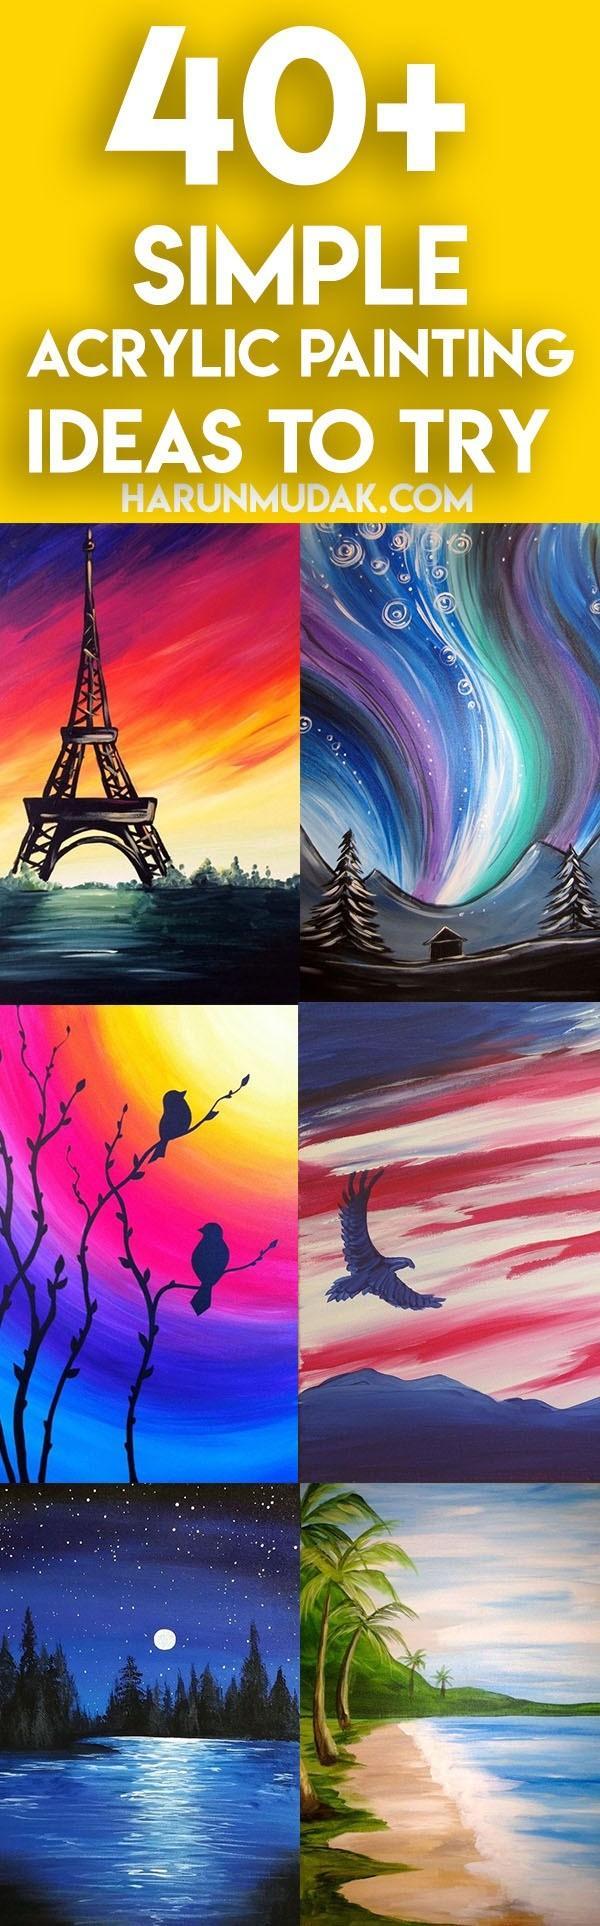 40 Simple Acrylic Painting Ideas To Try Harunmudak